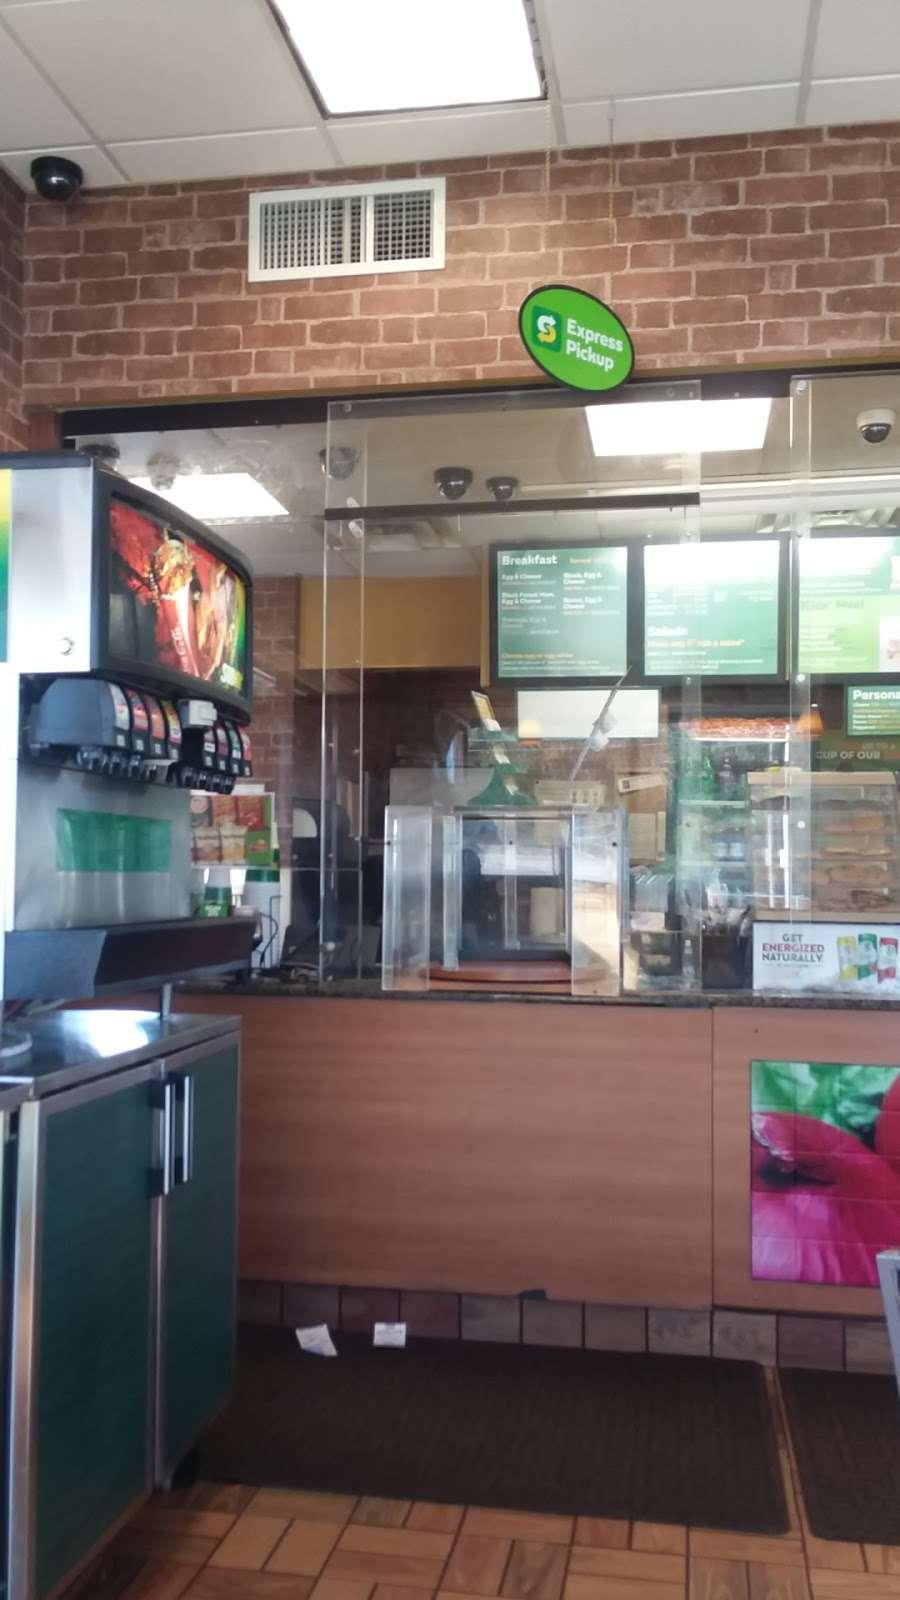 Subway - restaurant  | Photo 1 of 6 | Address: 3400 Grant St, Gary, IN 46408, USA | Phone: (219) 887-3000